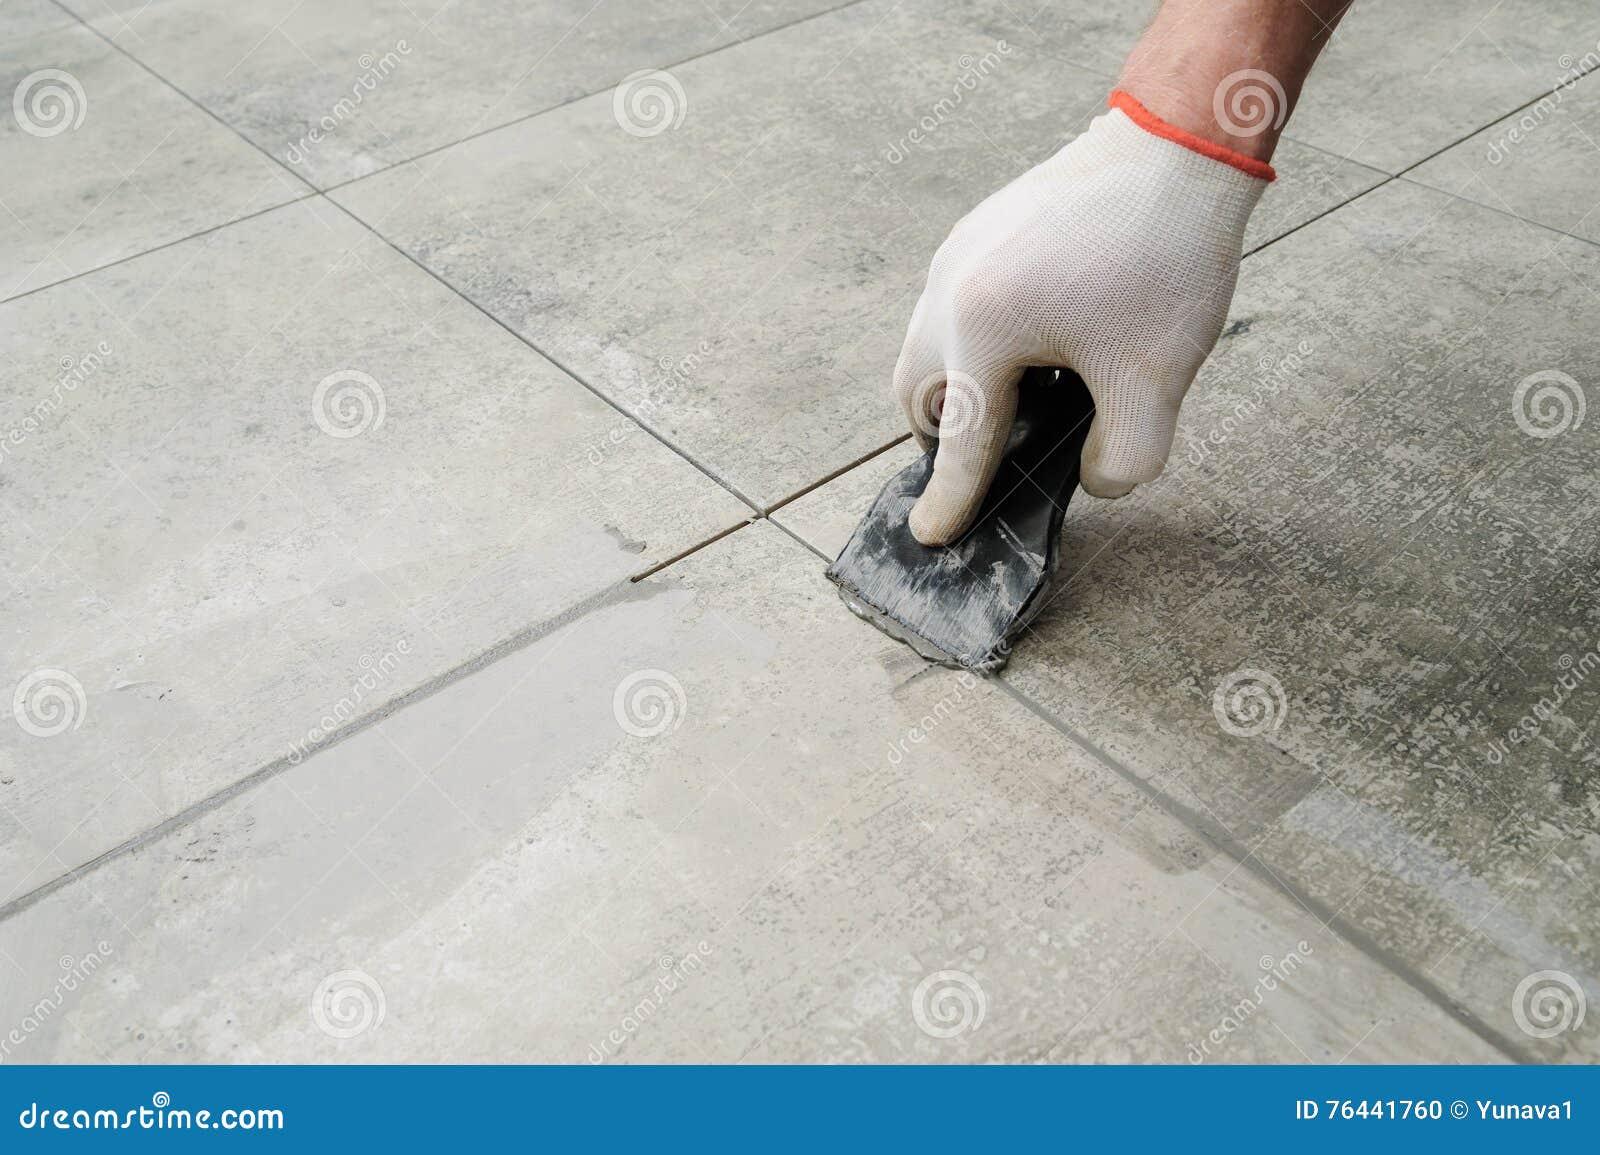 Grouting Ceramic Tiles Stock Photo Image Of Renovation 76441760